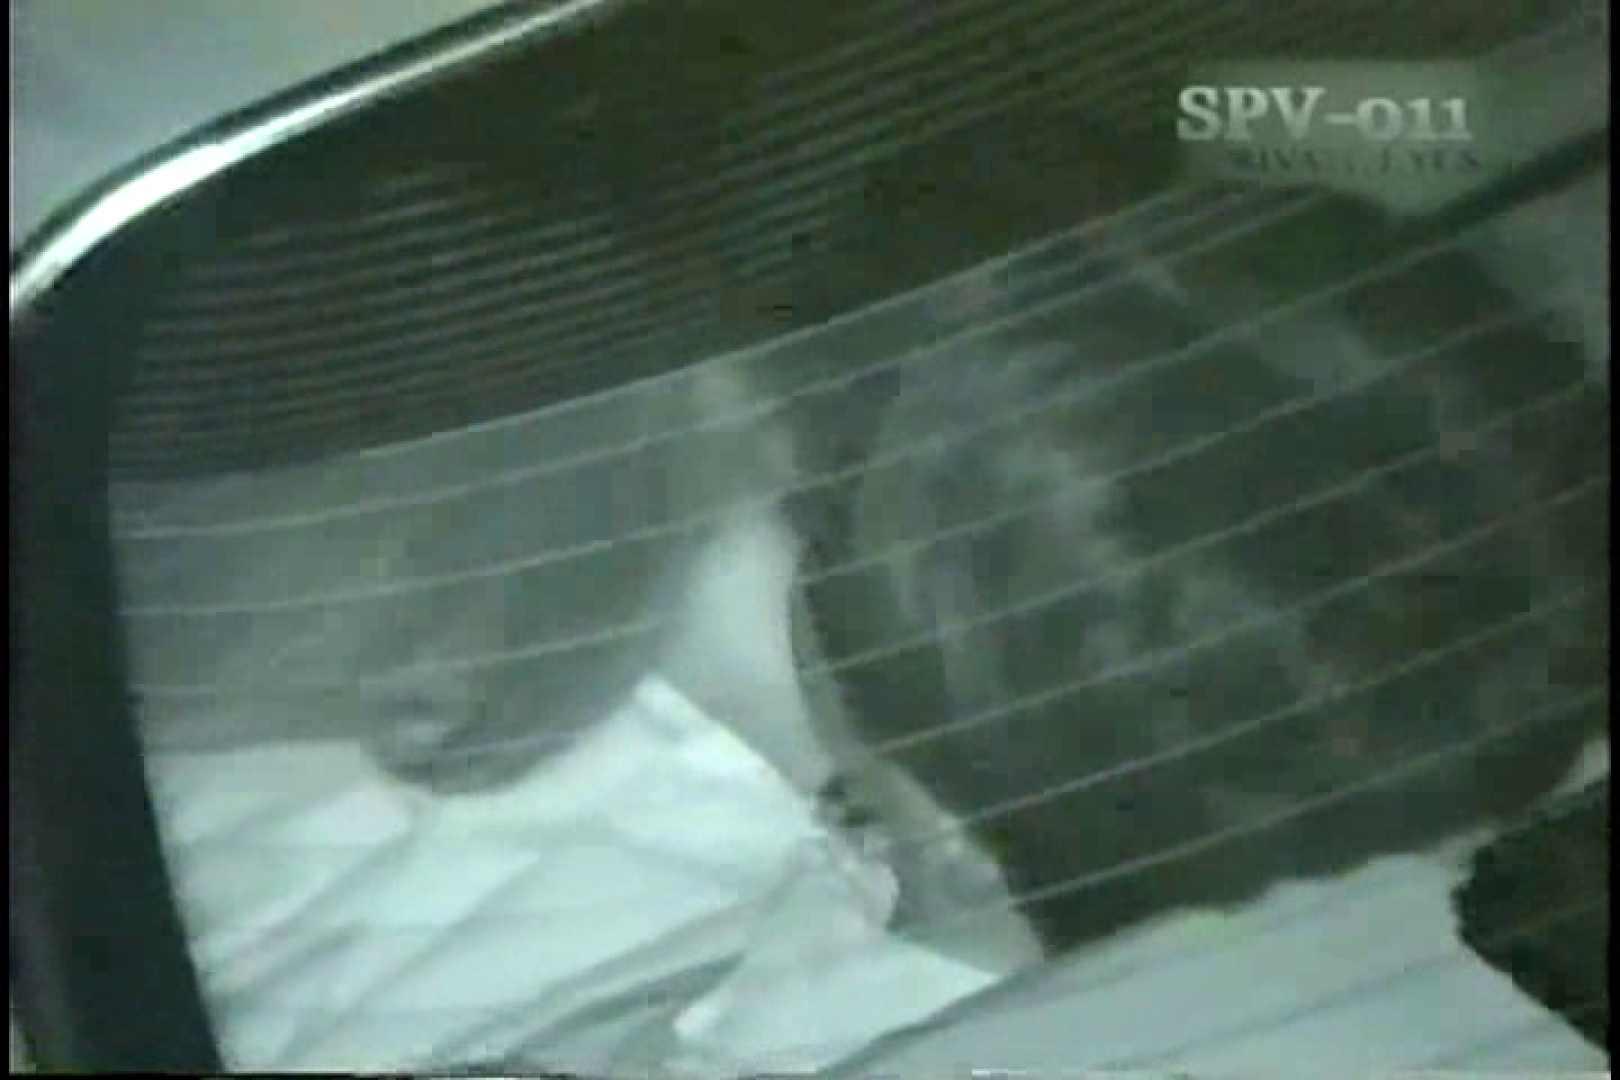 高画質版!SPD-011 盗撮 カーセックス黙示録 (VHS) 高画質 盗撮画像 107PIX 68